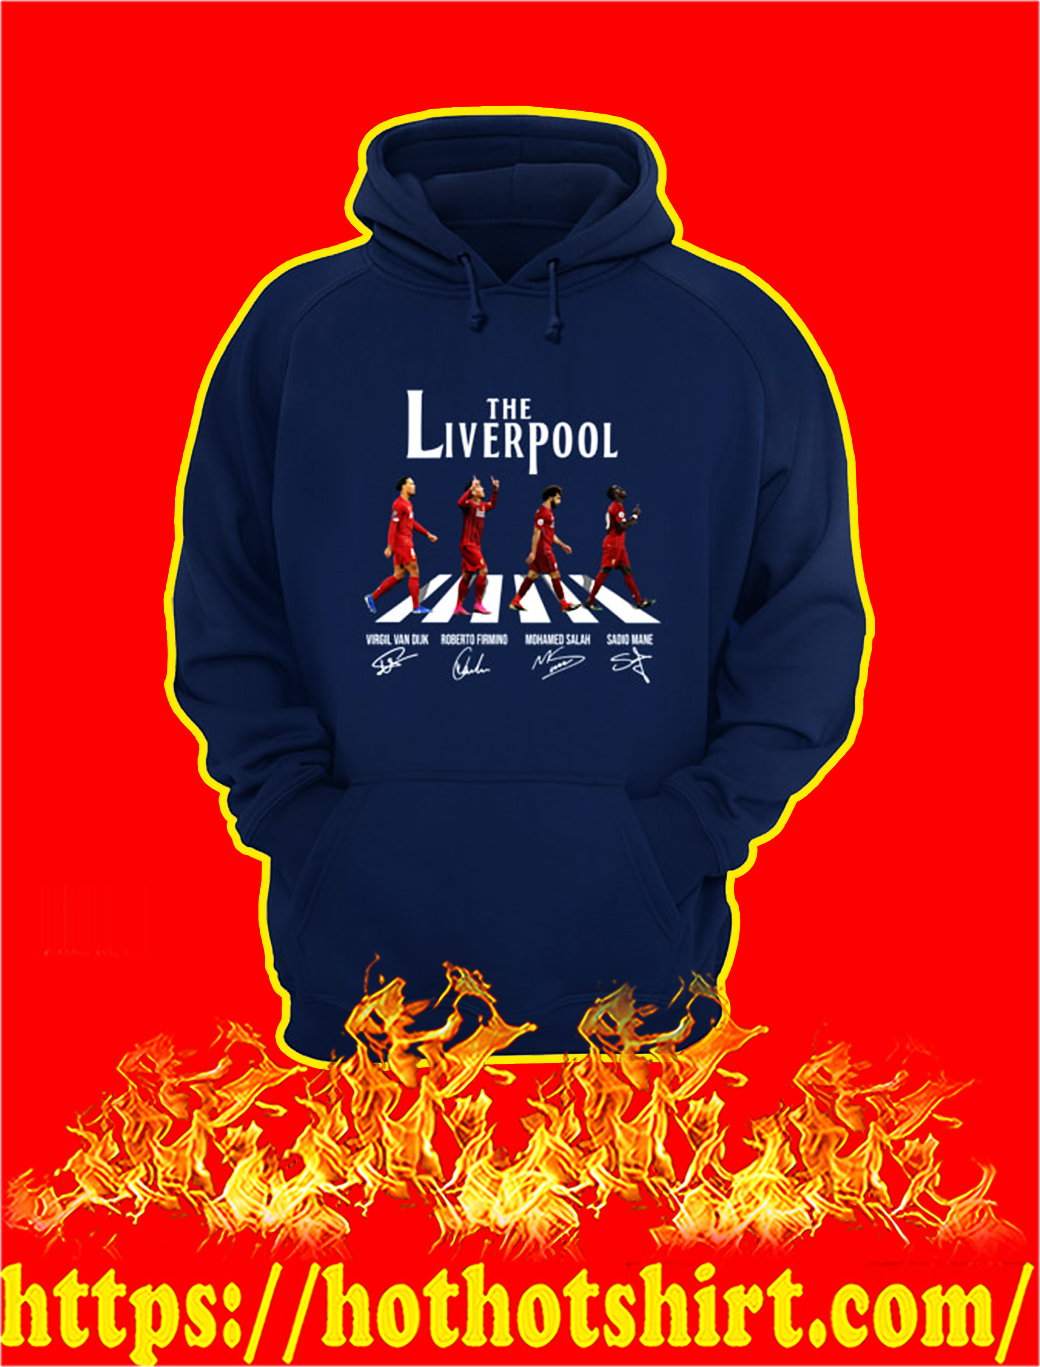 The Liverpool Abbey Road Virgin Firmino Salah Mane Signature hoodie